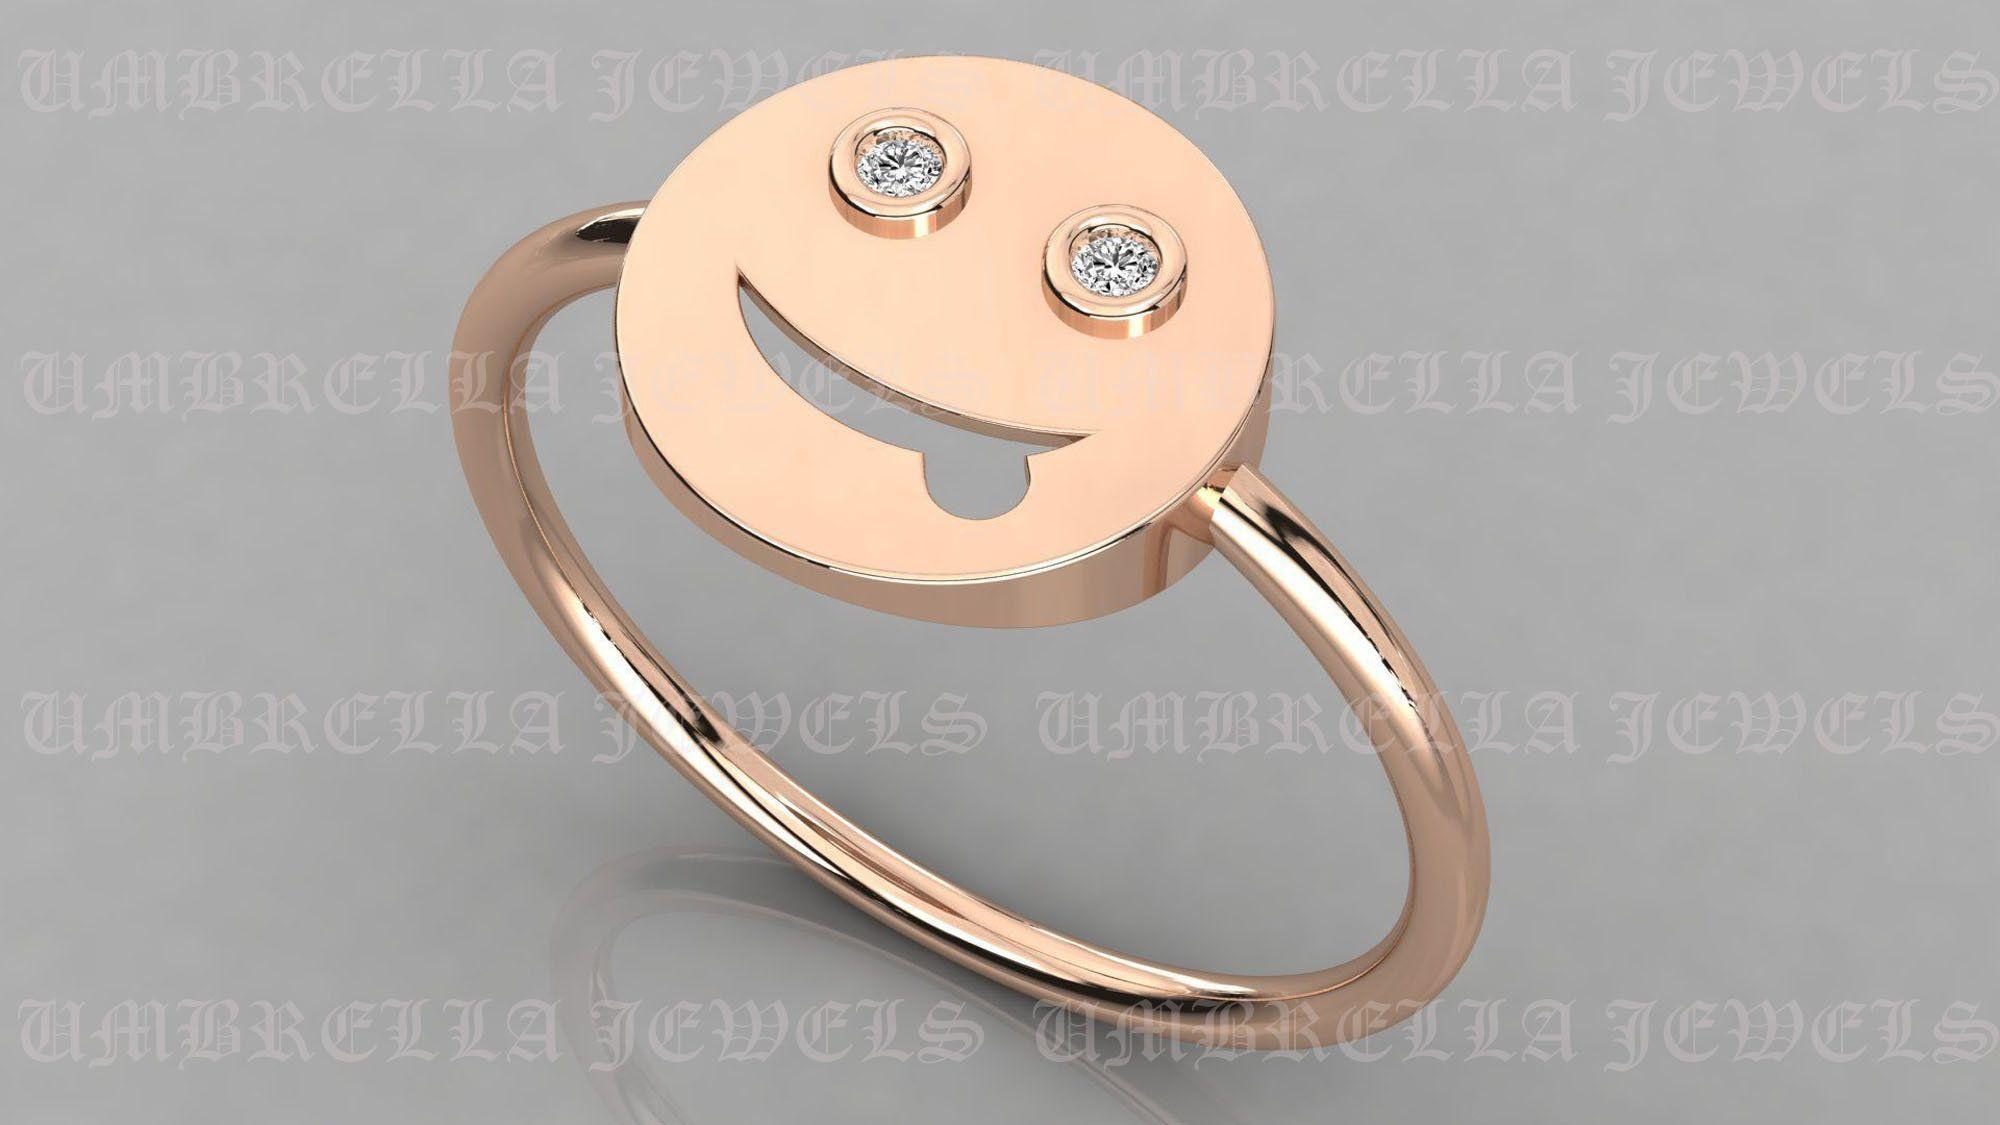 Mood Ring Smiley Face Ring Happy Face Ring Flip Ring Etsy In 2020 Emoji Ring Emoji Jewelry Mood Ring